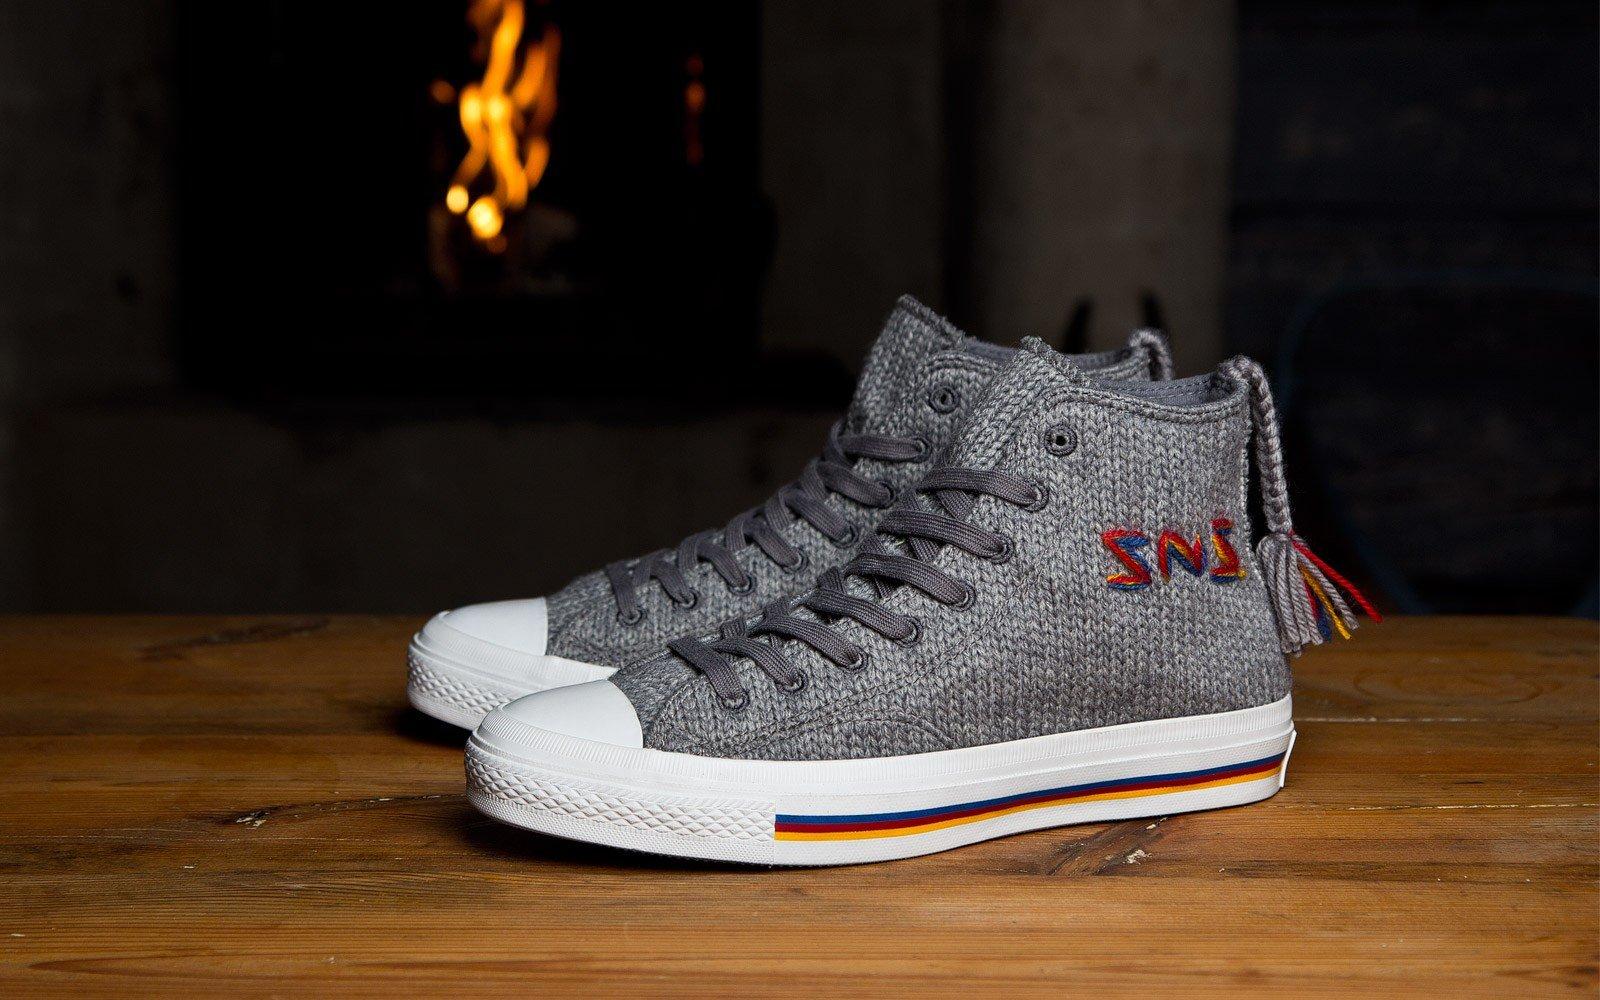 Release Reminder: Sneakersnstuff x Converse Lovikka All Star